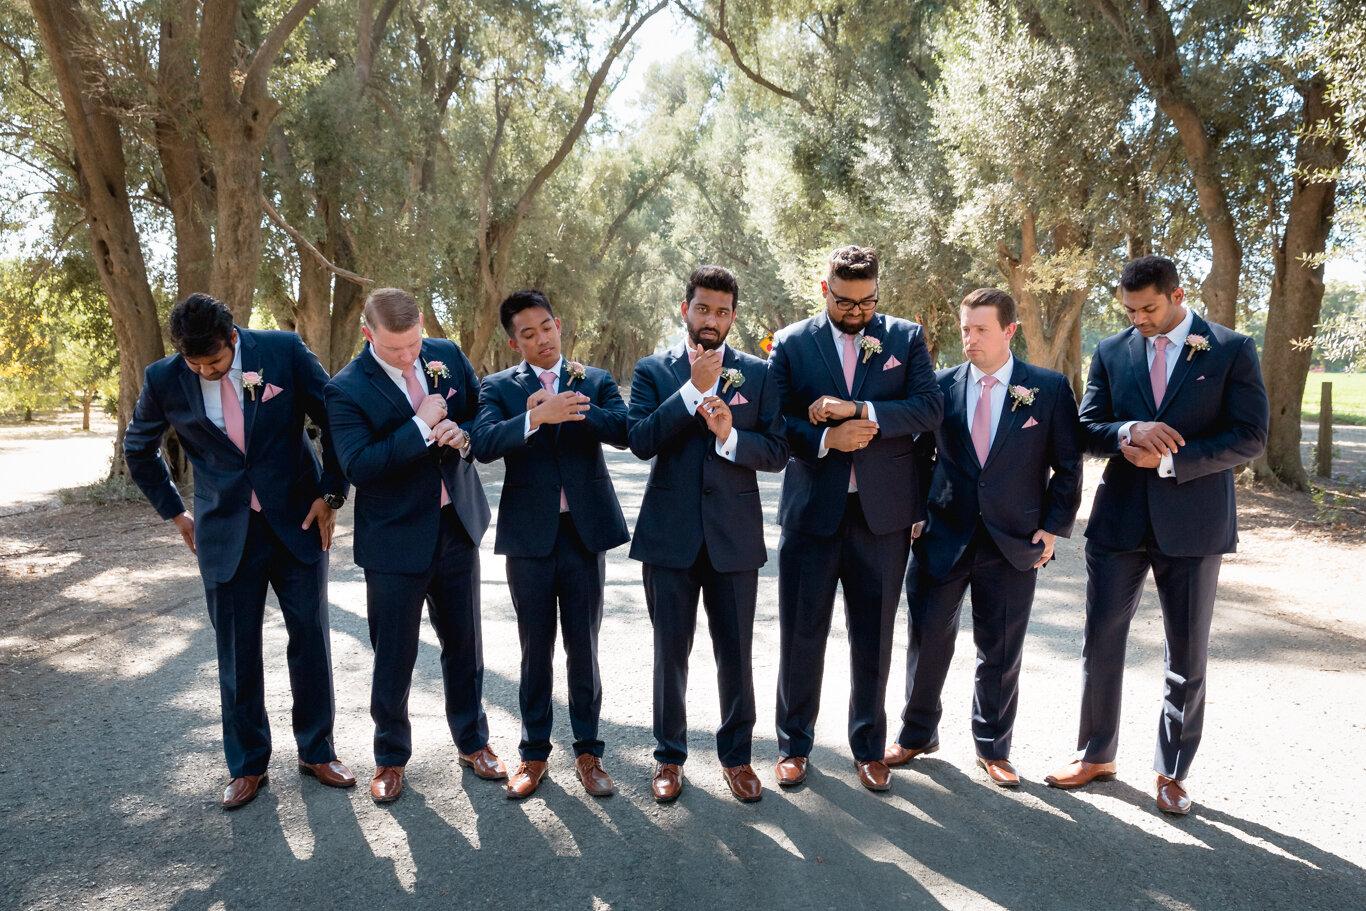 2019.08.24_Emily-Ashir-Wedding-at-the-Maples-5352.jpg